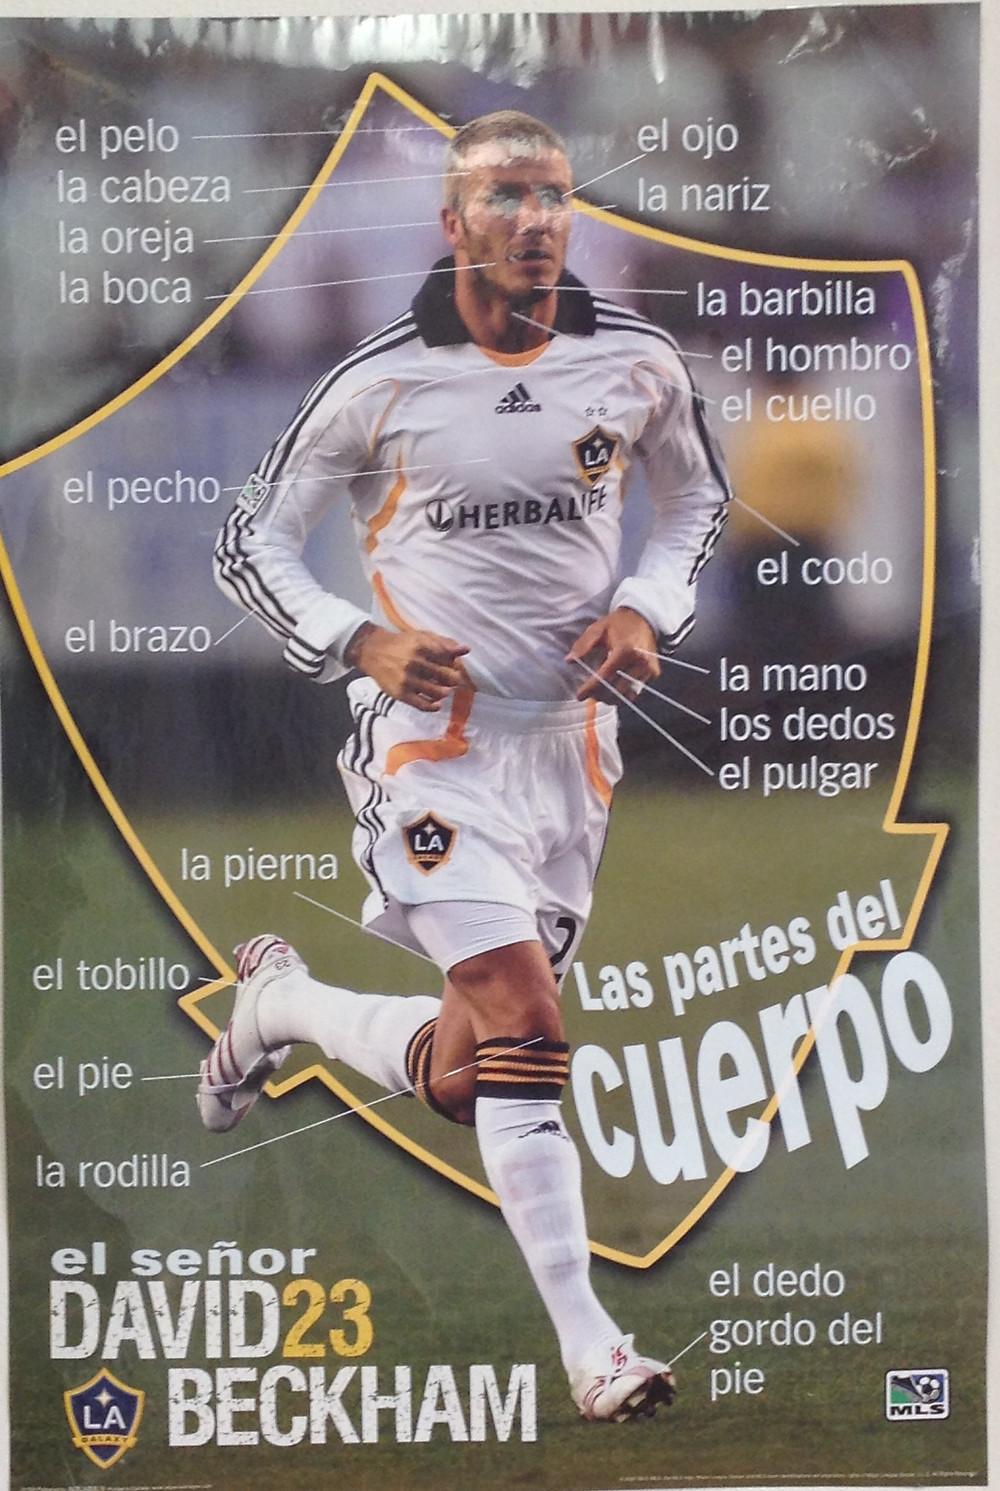 photo of David Beckham poster